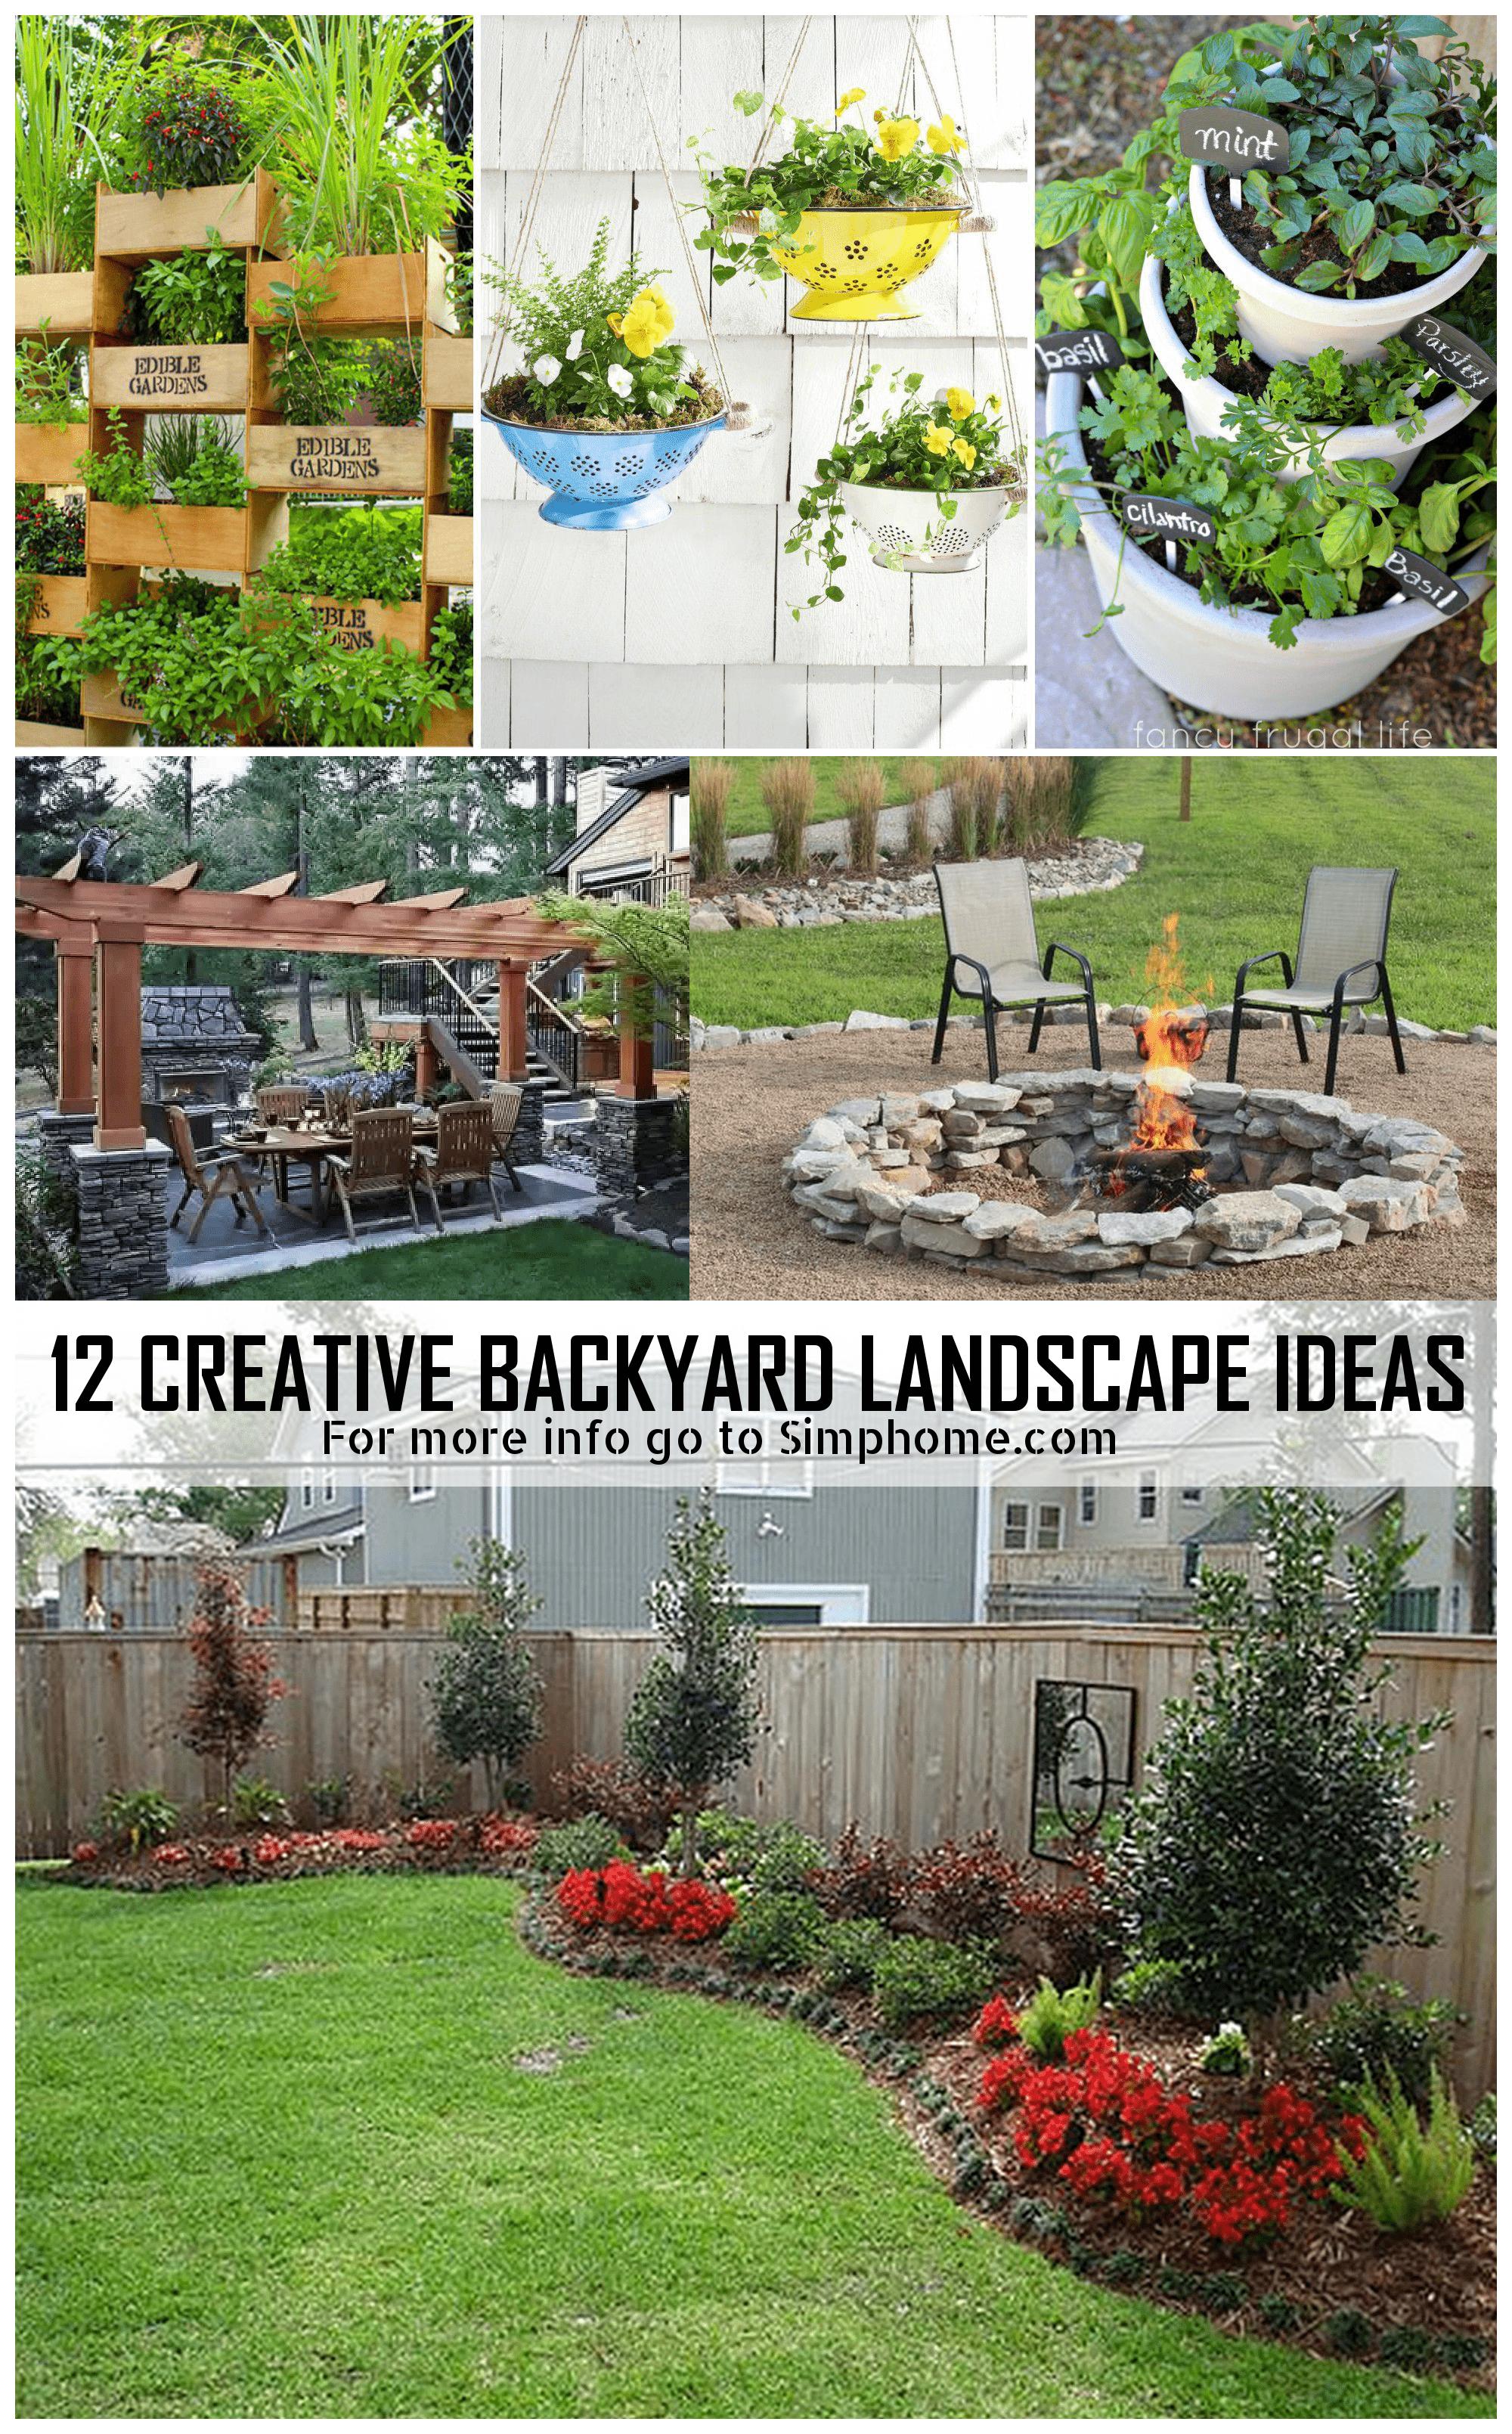 SIMPHOME.COM 12 Genius Concepts of How to Make Landscape Ideas For Backyard min